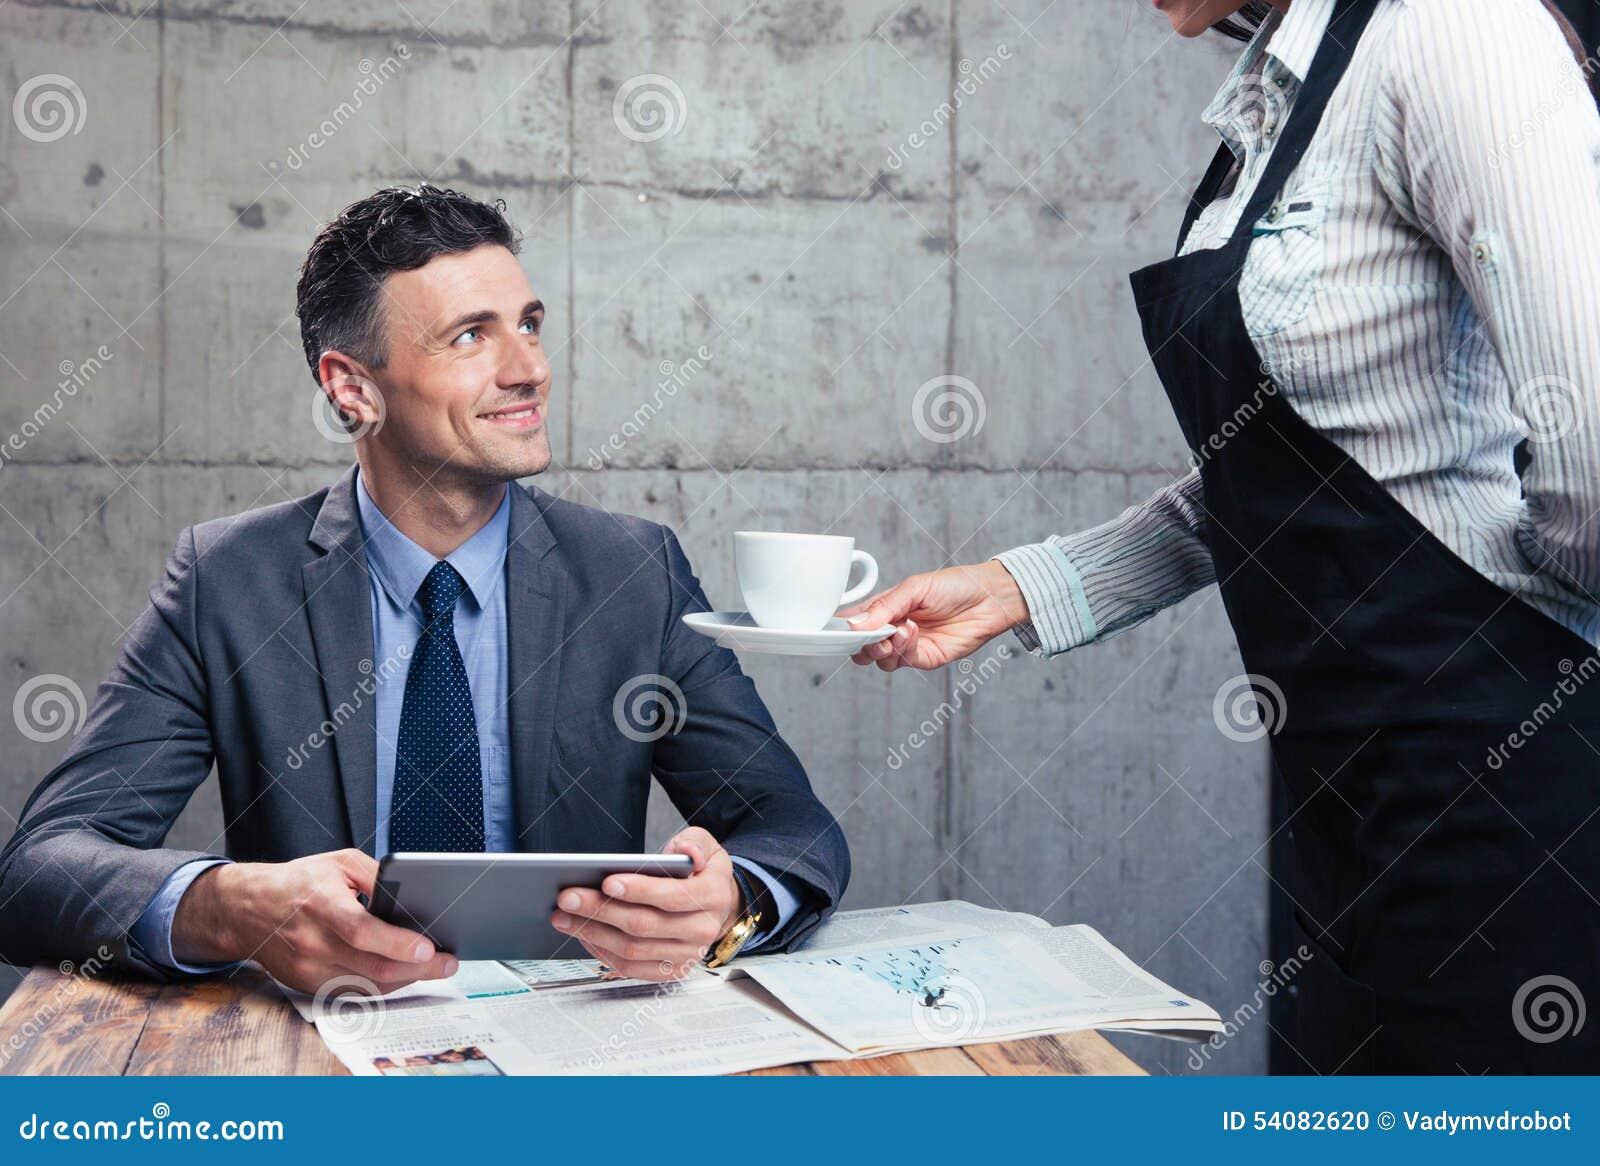 Serveerster die kop met koffie geven aan de mens